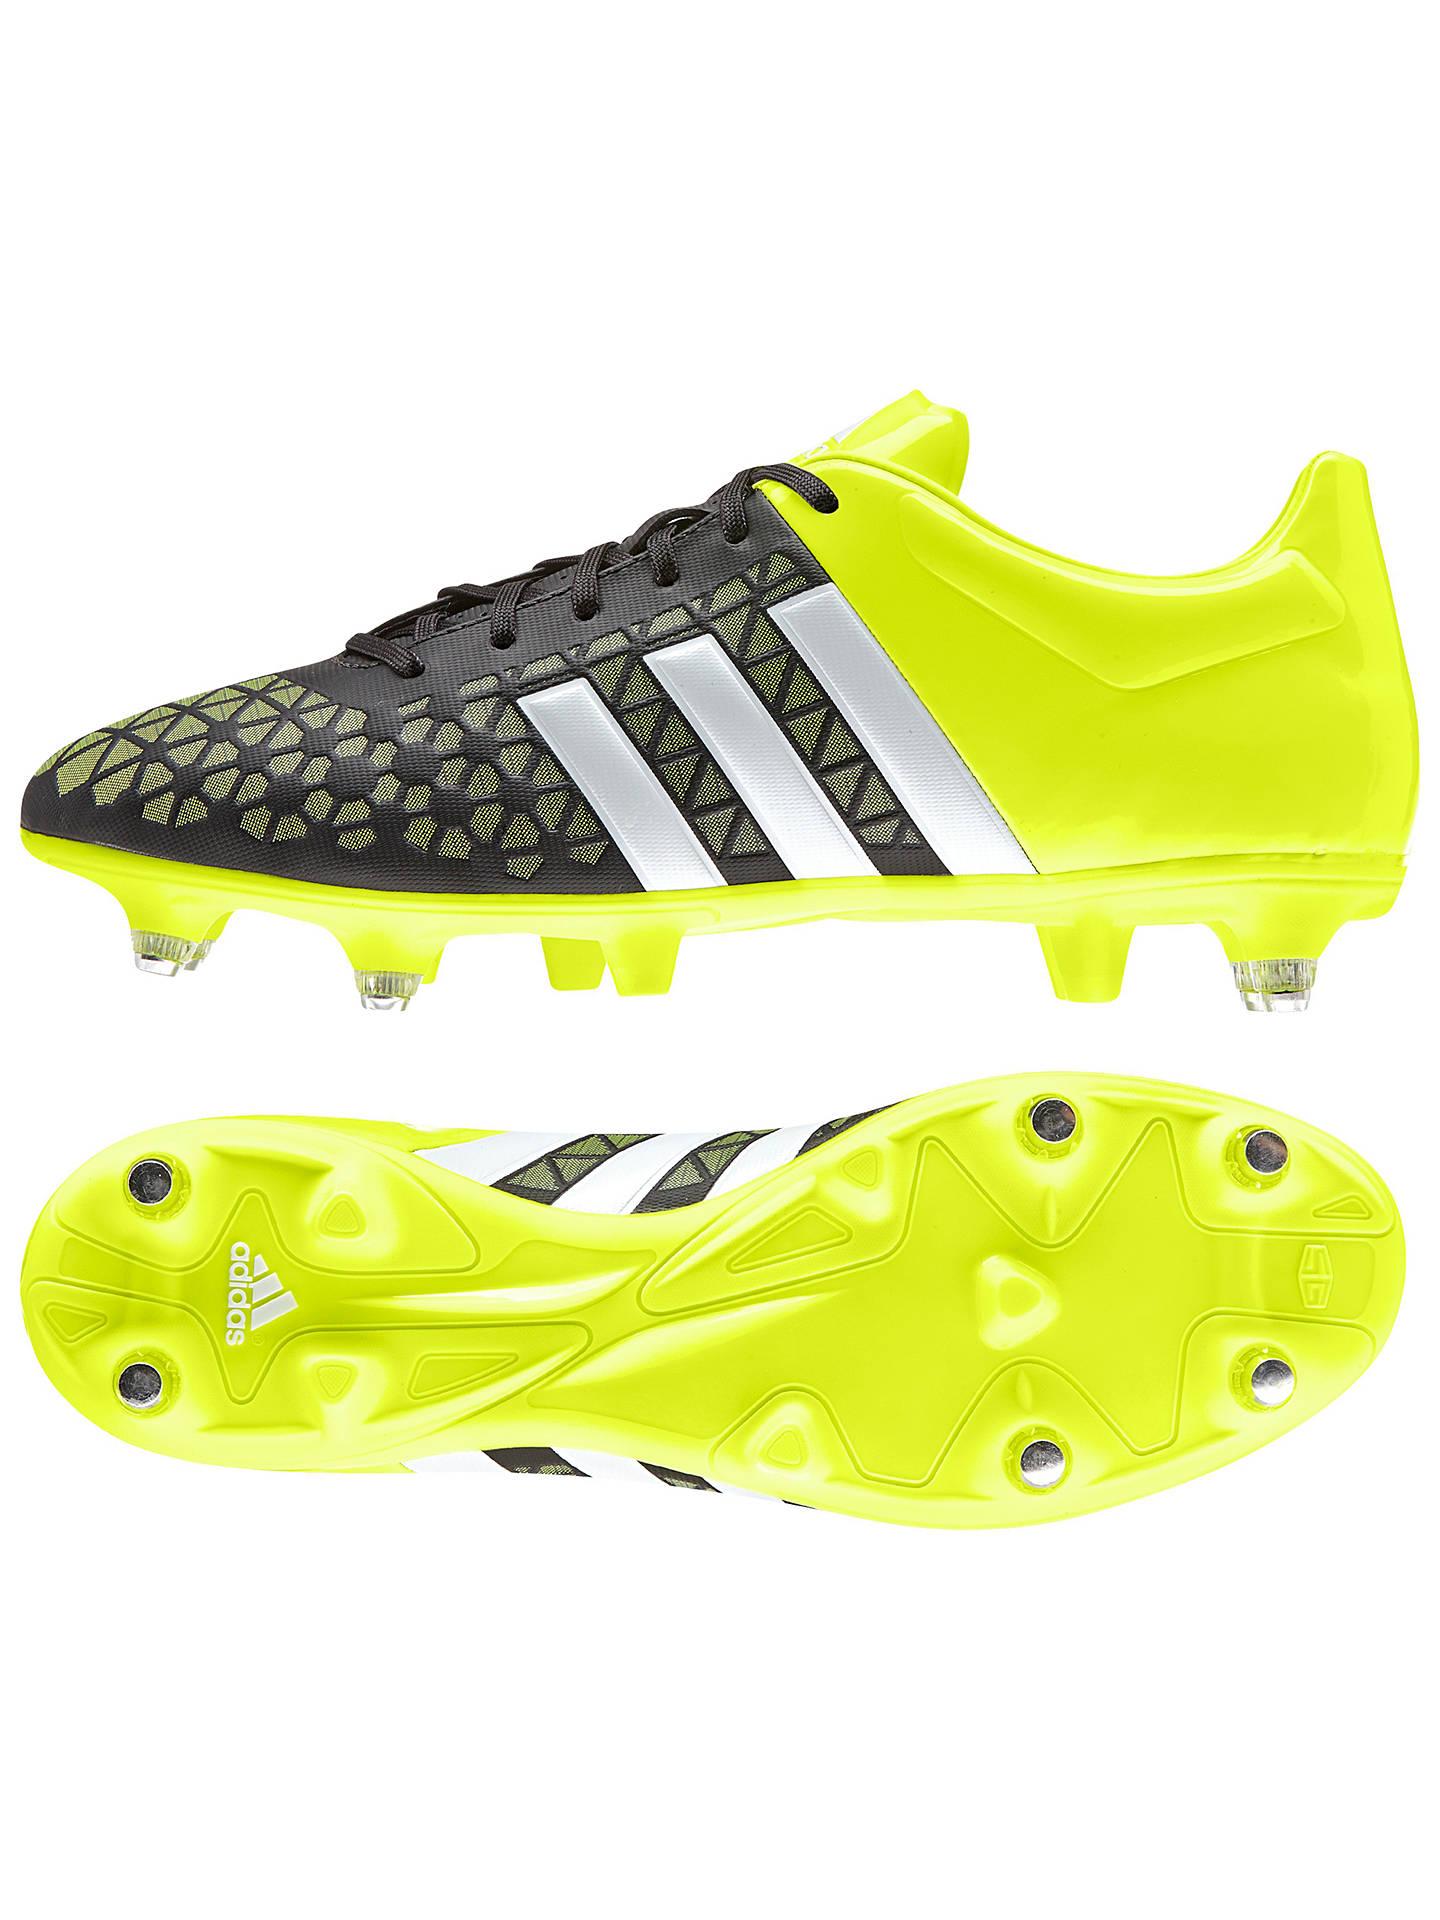 adidas ace 15.3 mens football boots